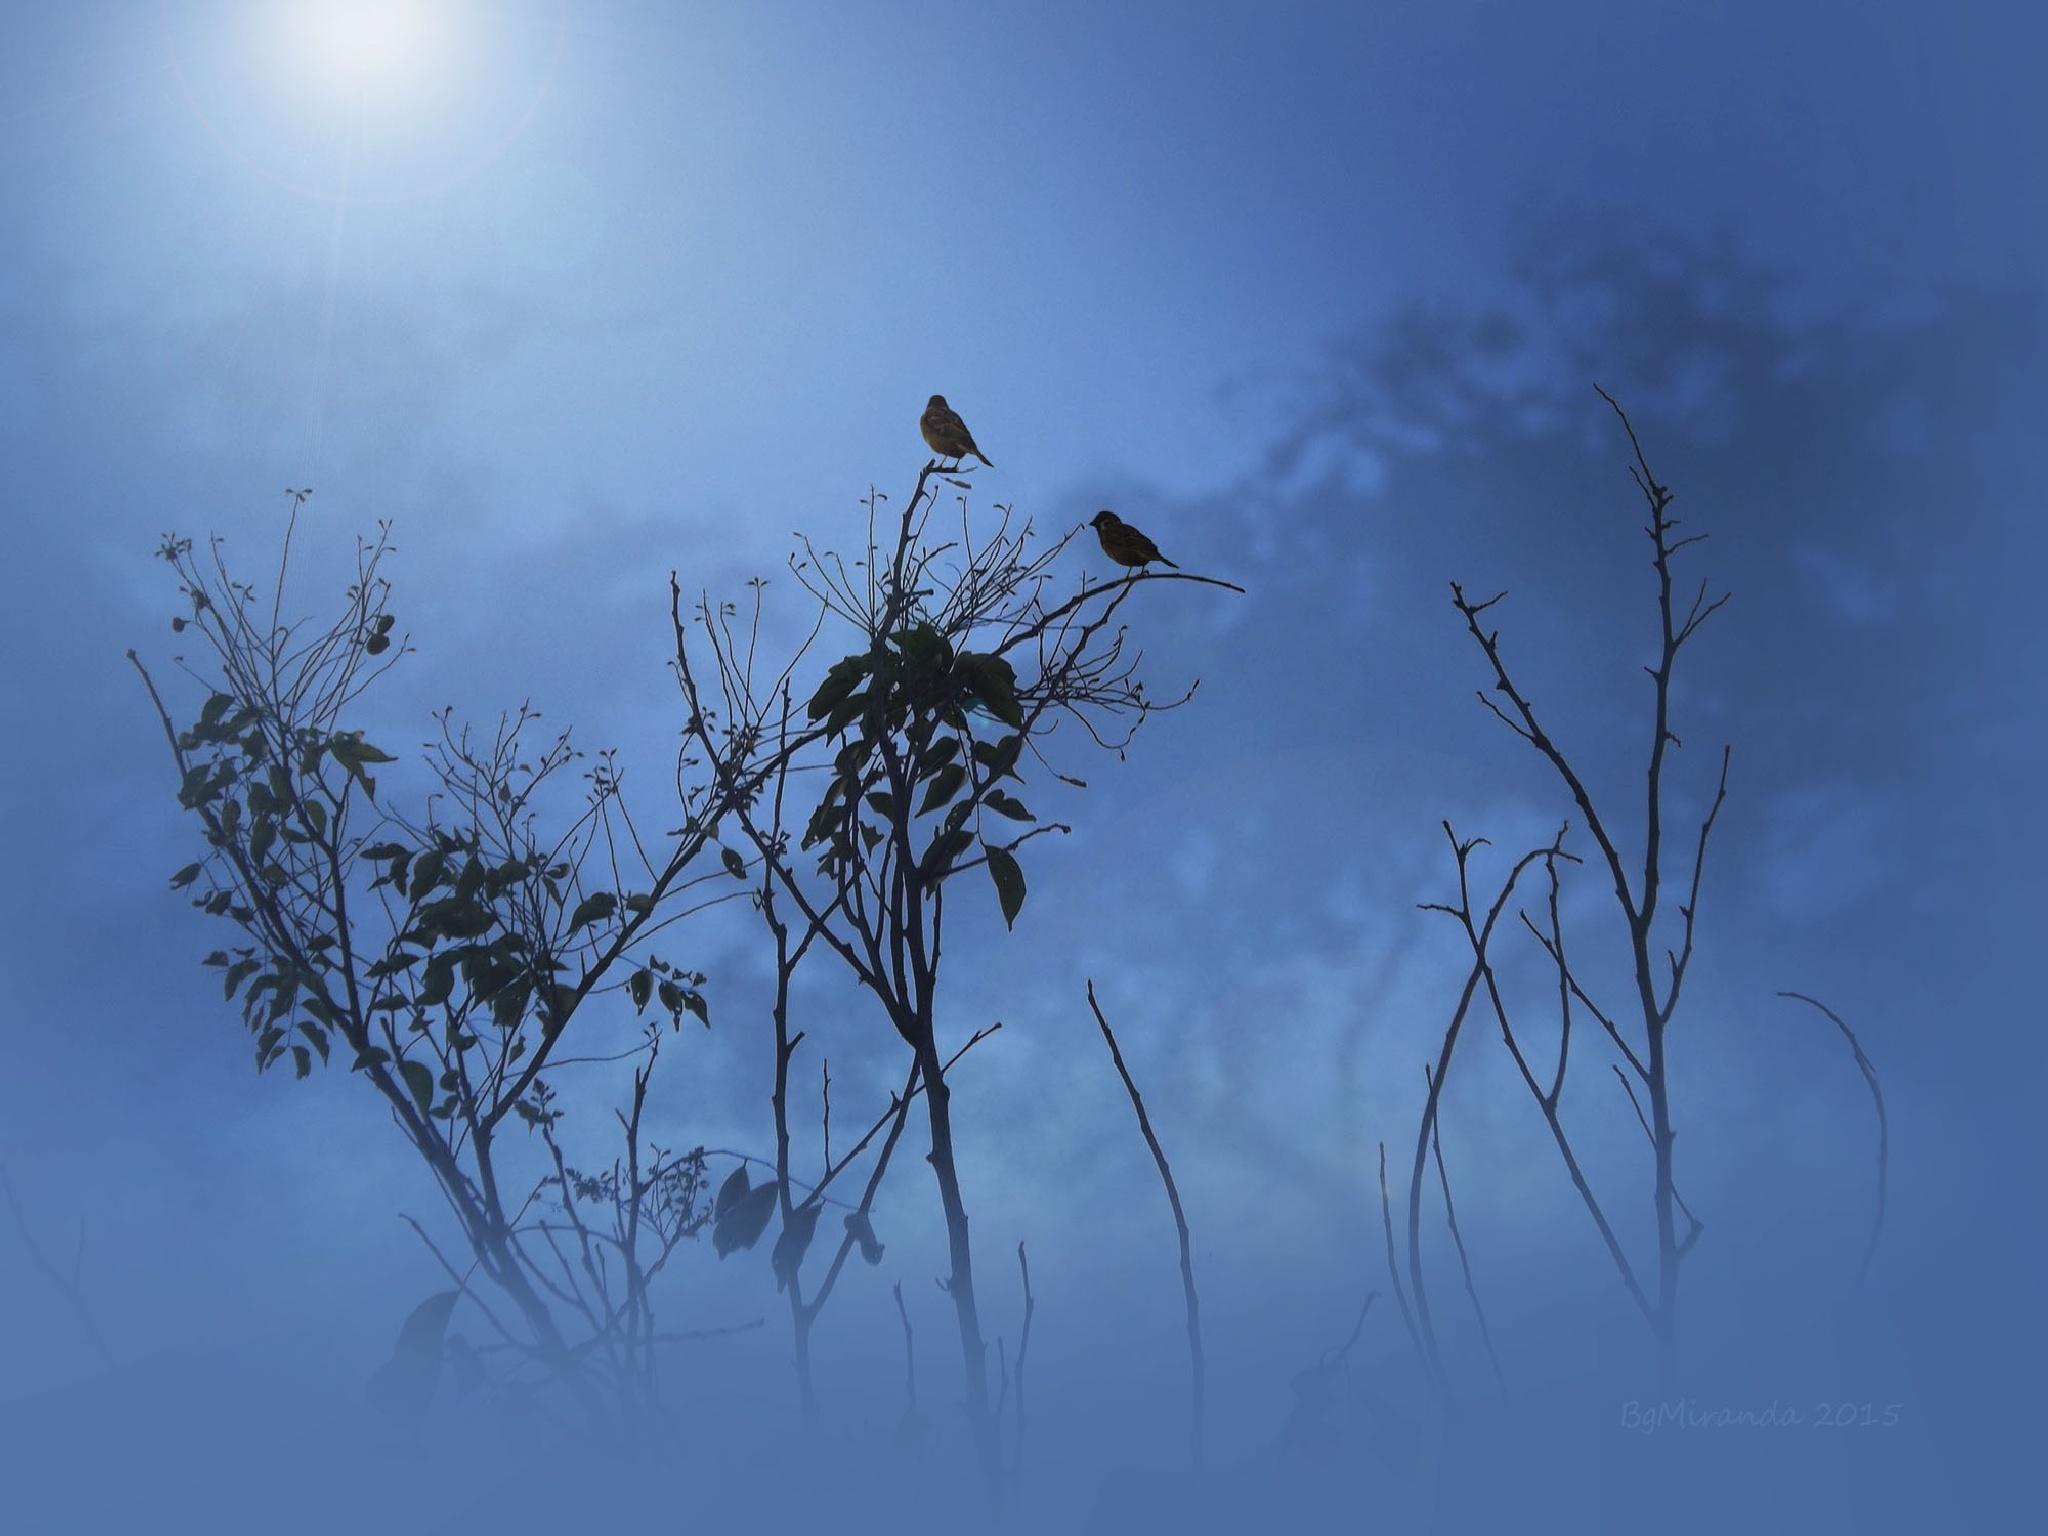 Sparrows in the Morning Blues by Bernard Miranda